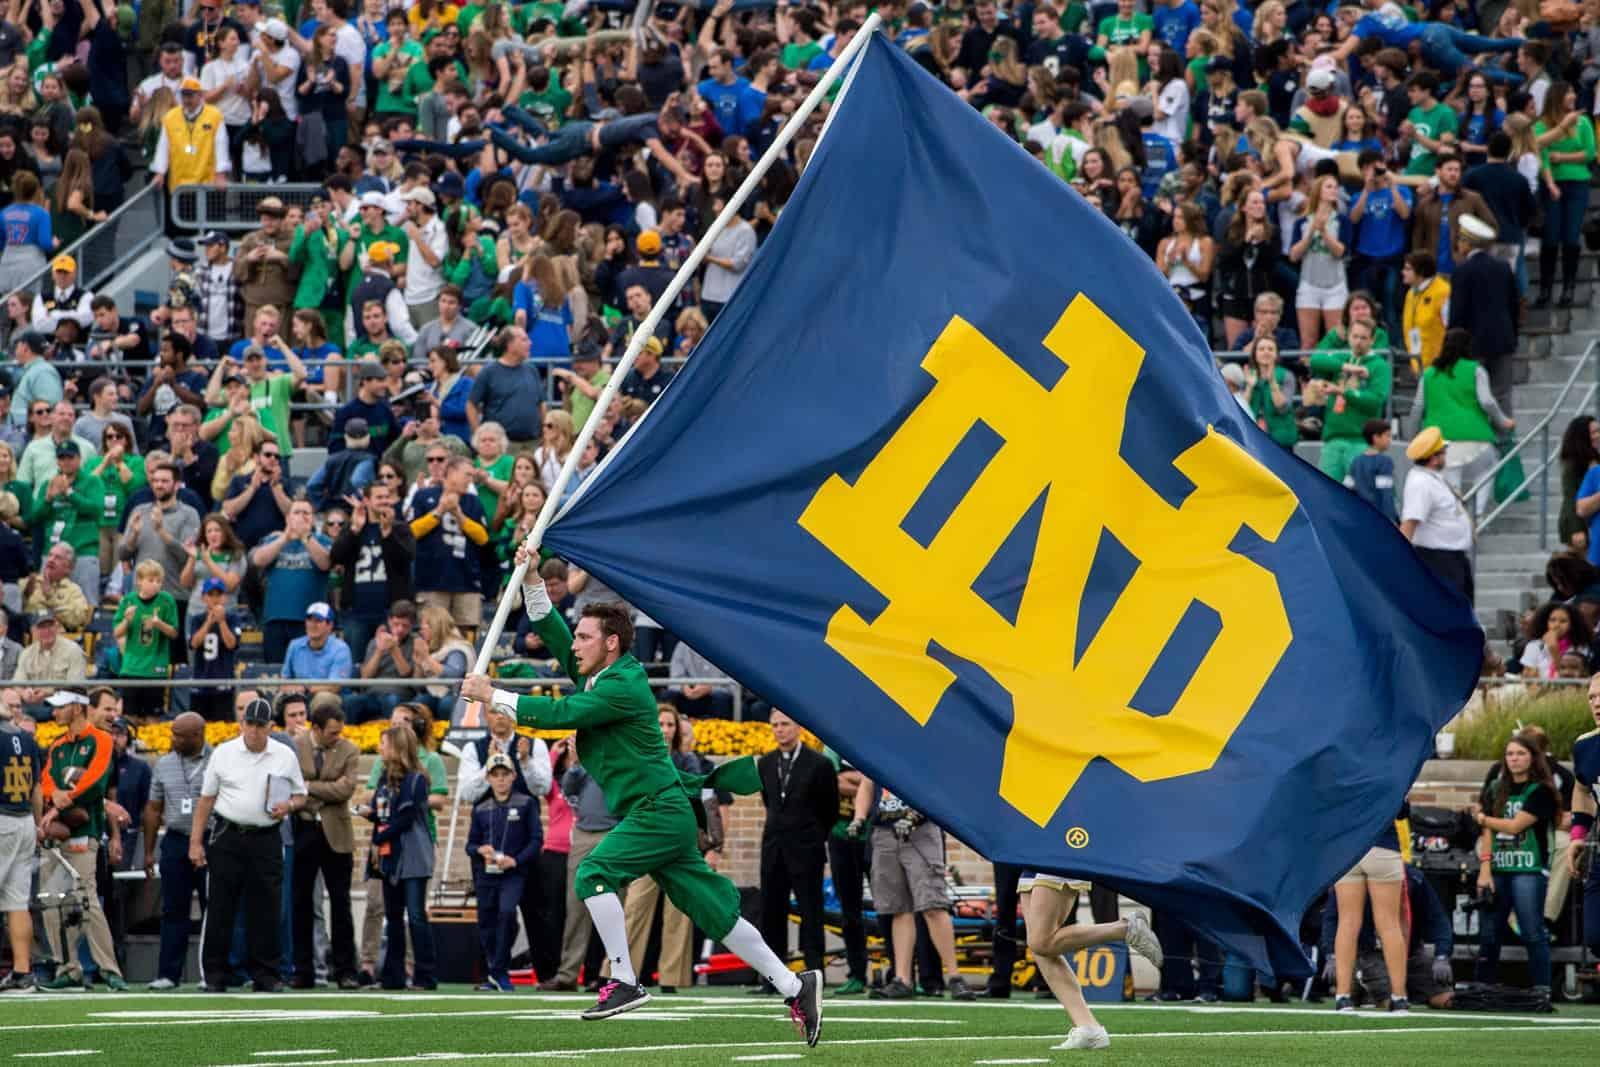 2020 Notre Dame Football Schedule